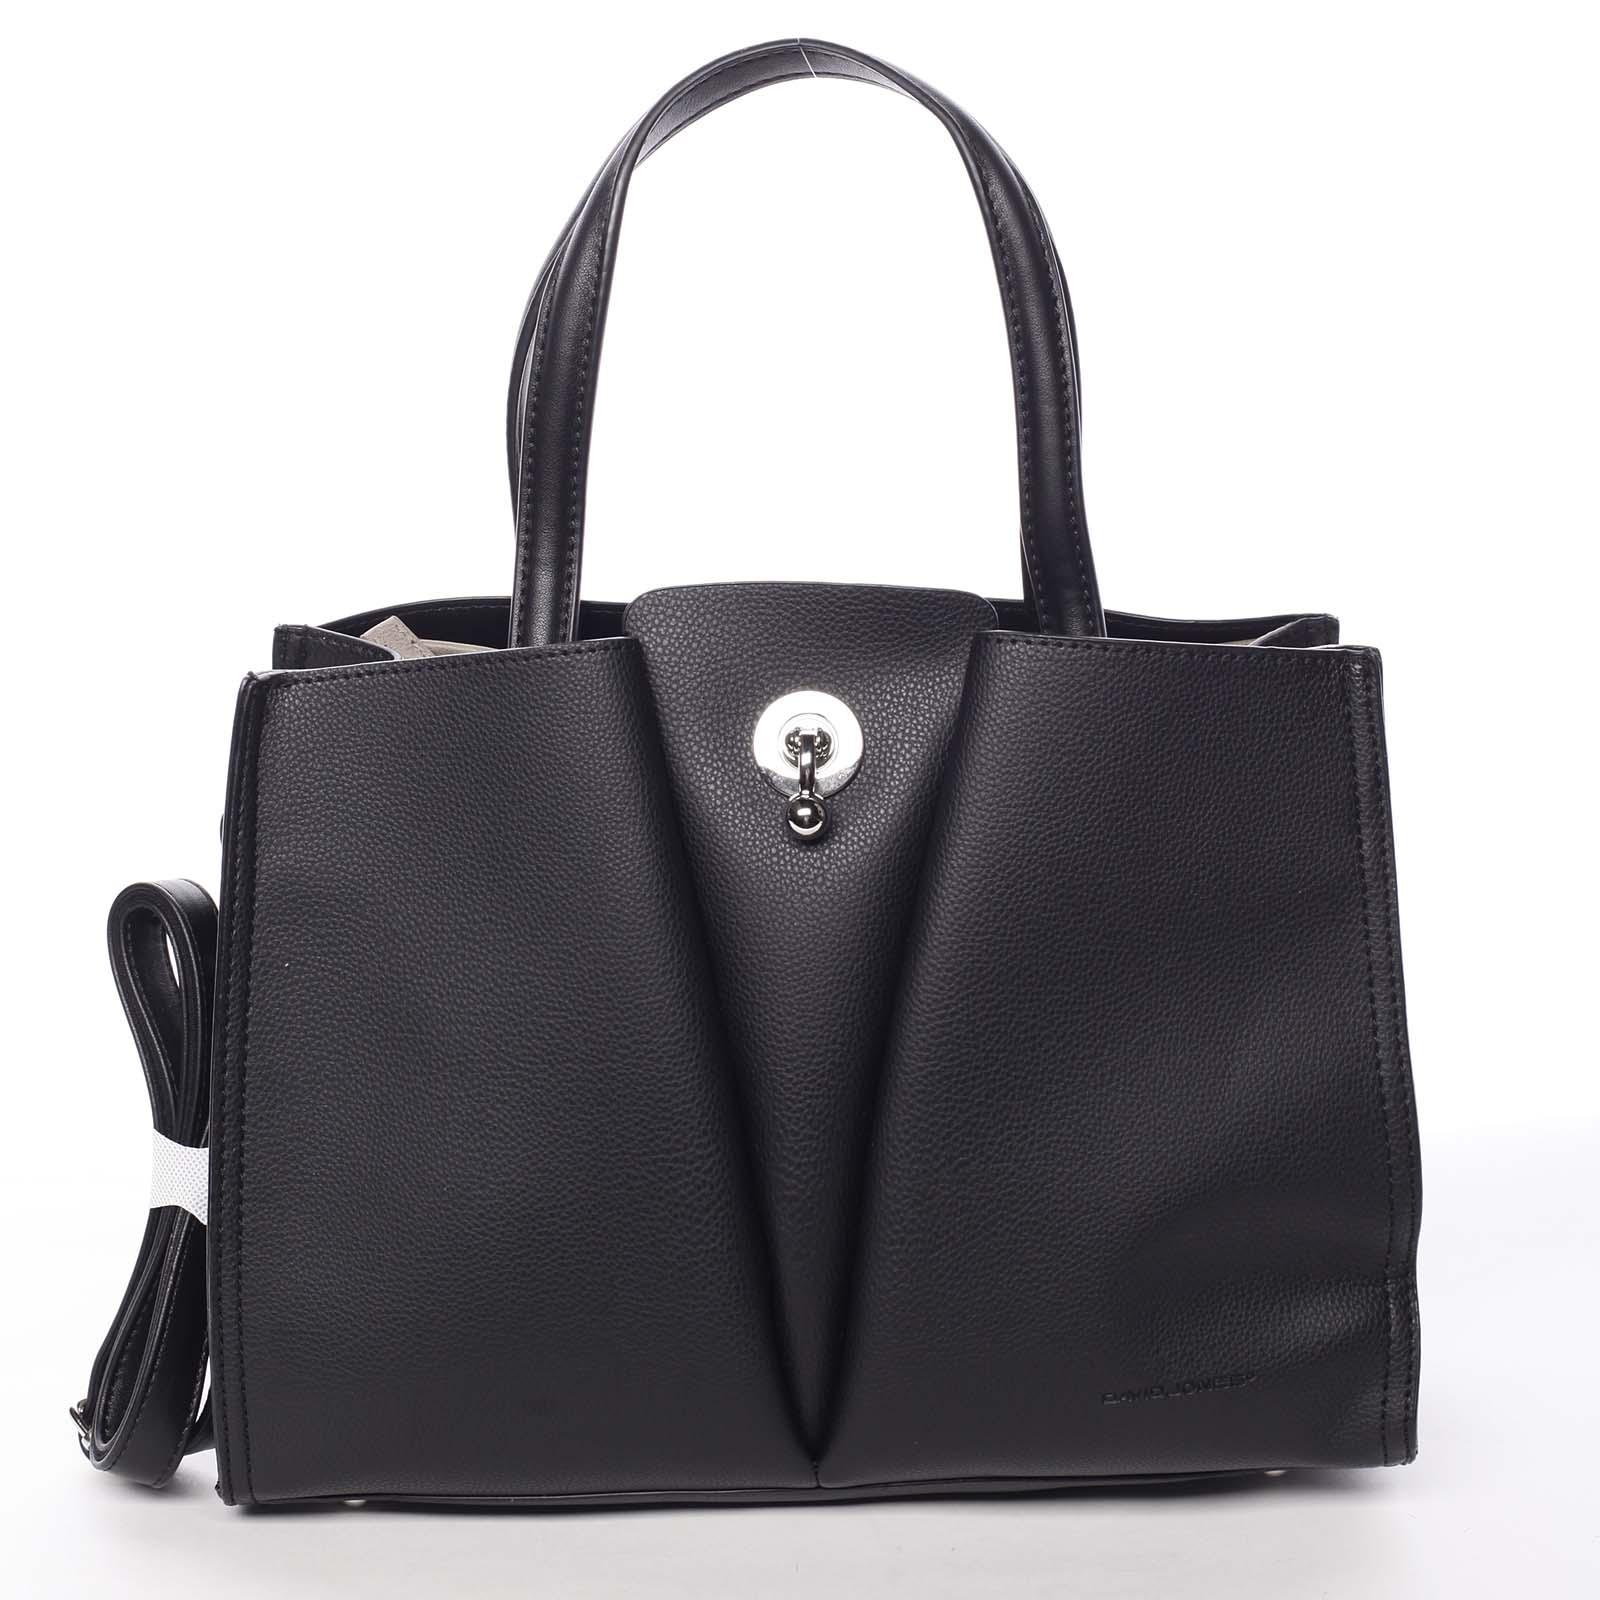 Luxusná dámska čierna kabelka do ruky - David Jones Aedon čierna